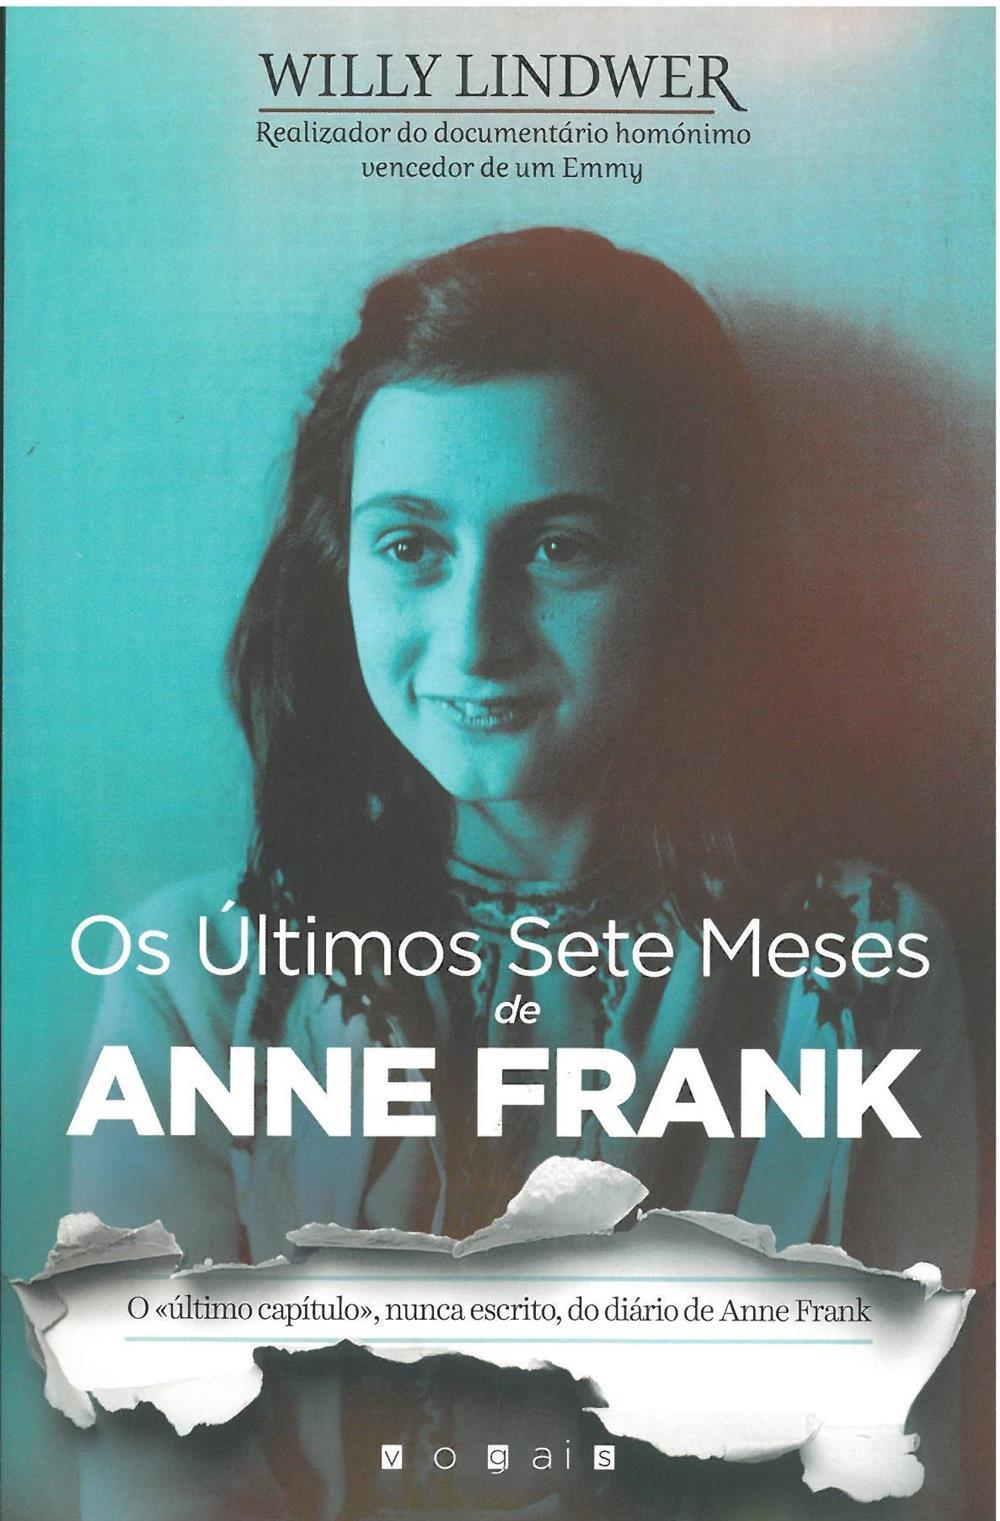 Os últimos sete meses de Anne Frank_.jpg